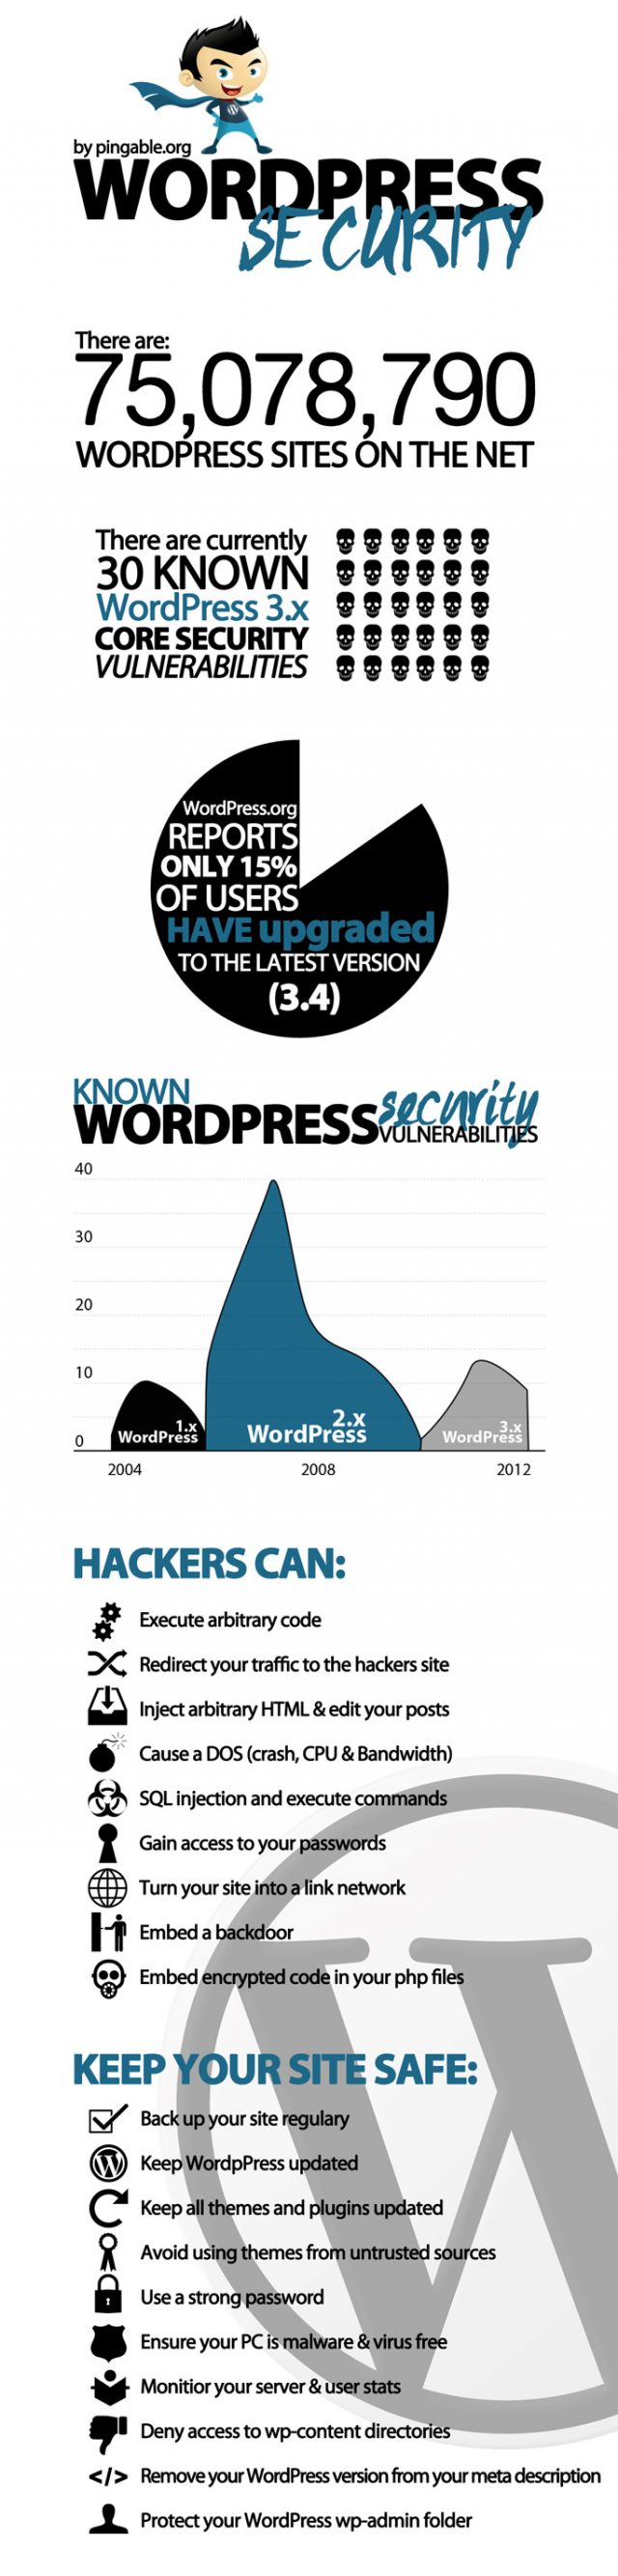 WordPress : Sécurité